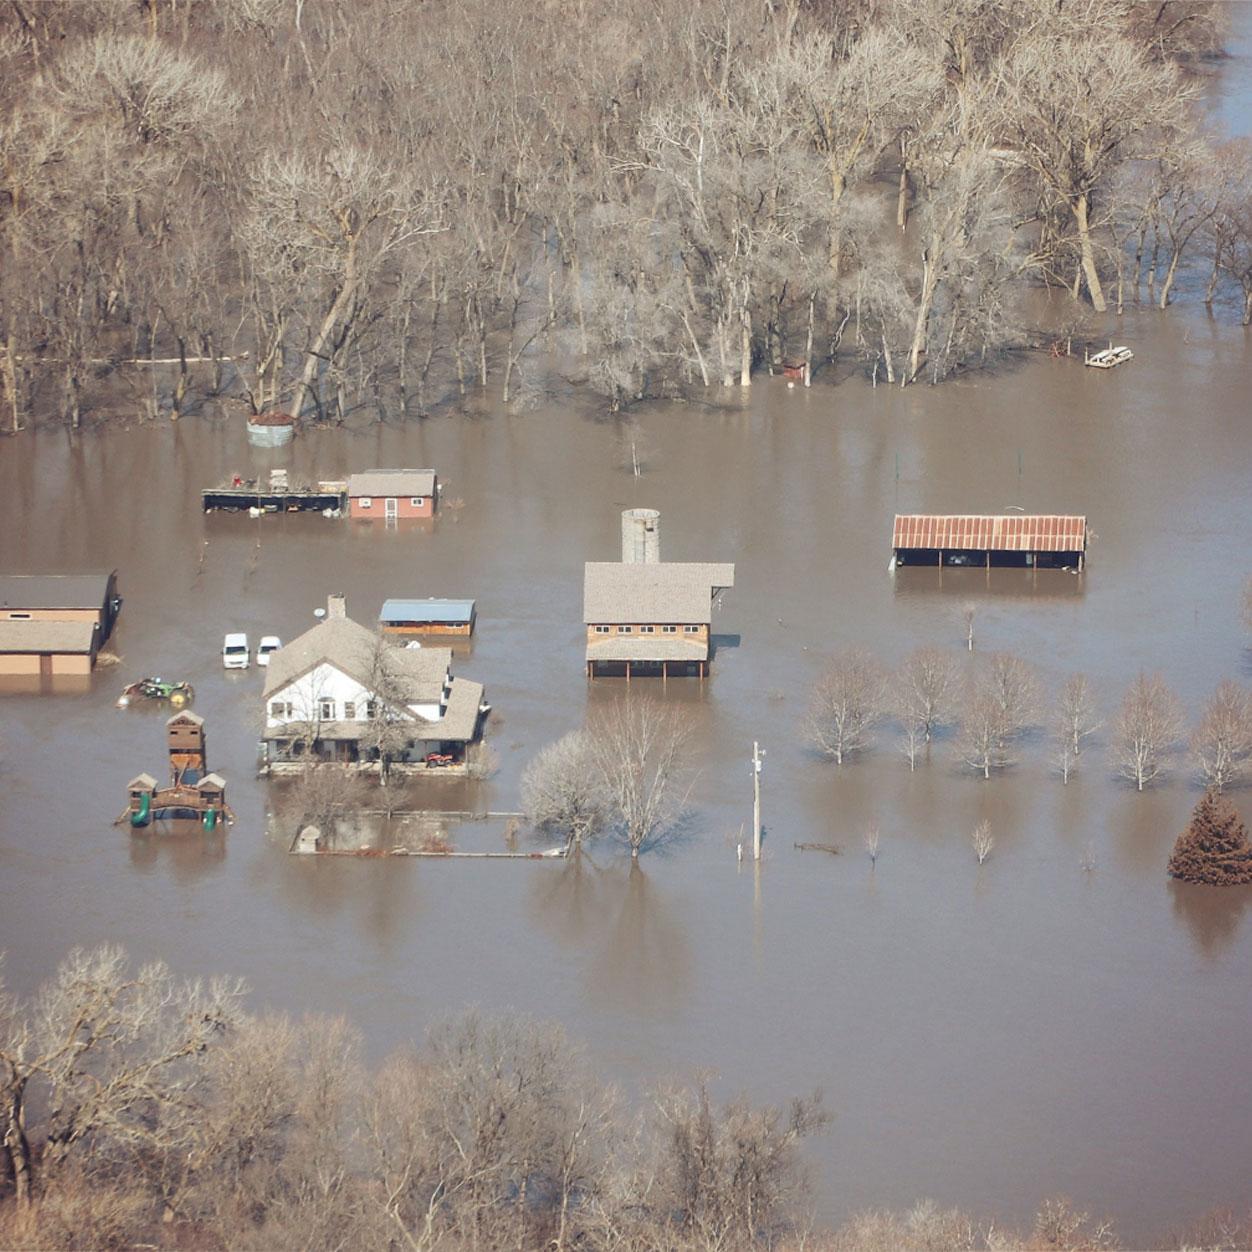 02dd631a6c28 Disaster Relief - Matthew 25 Ministries